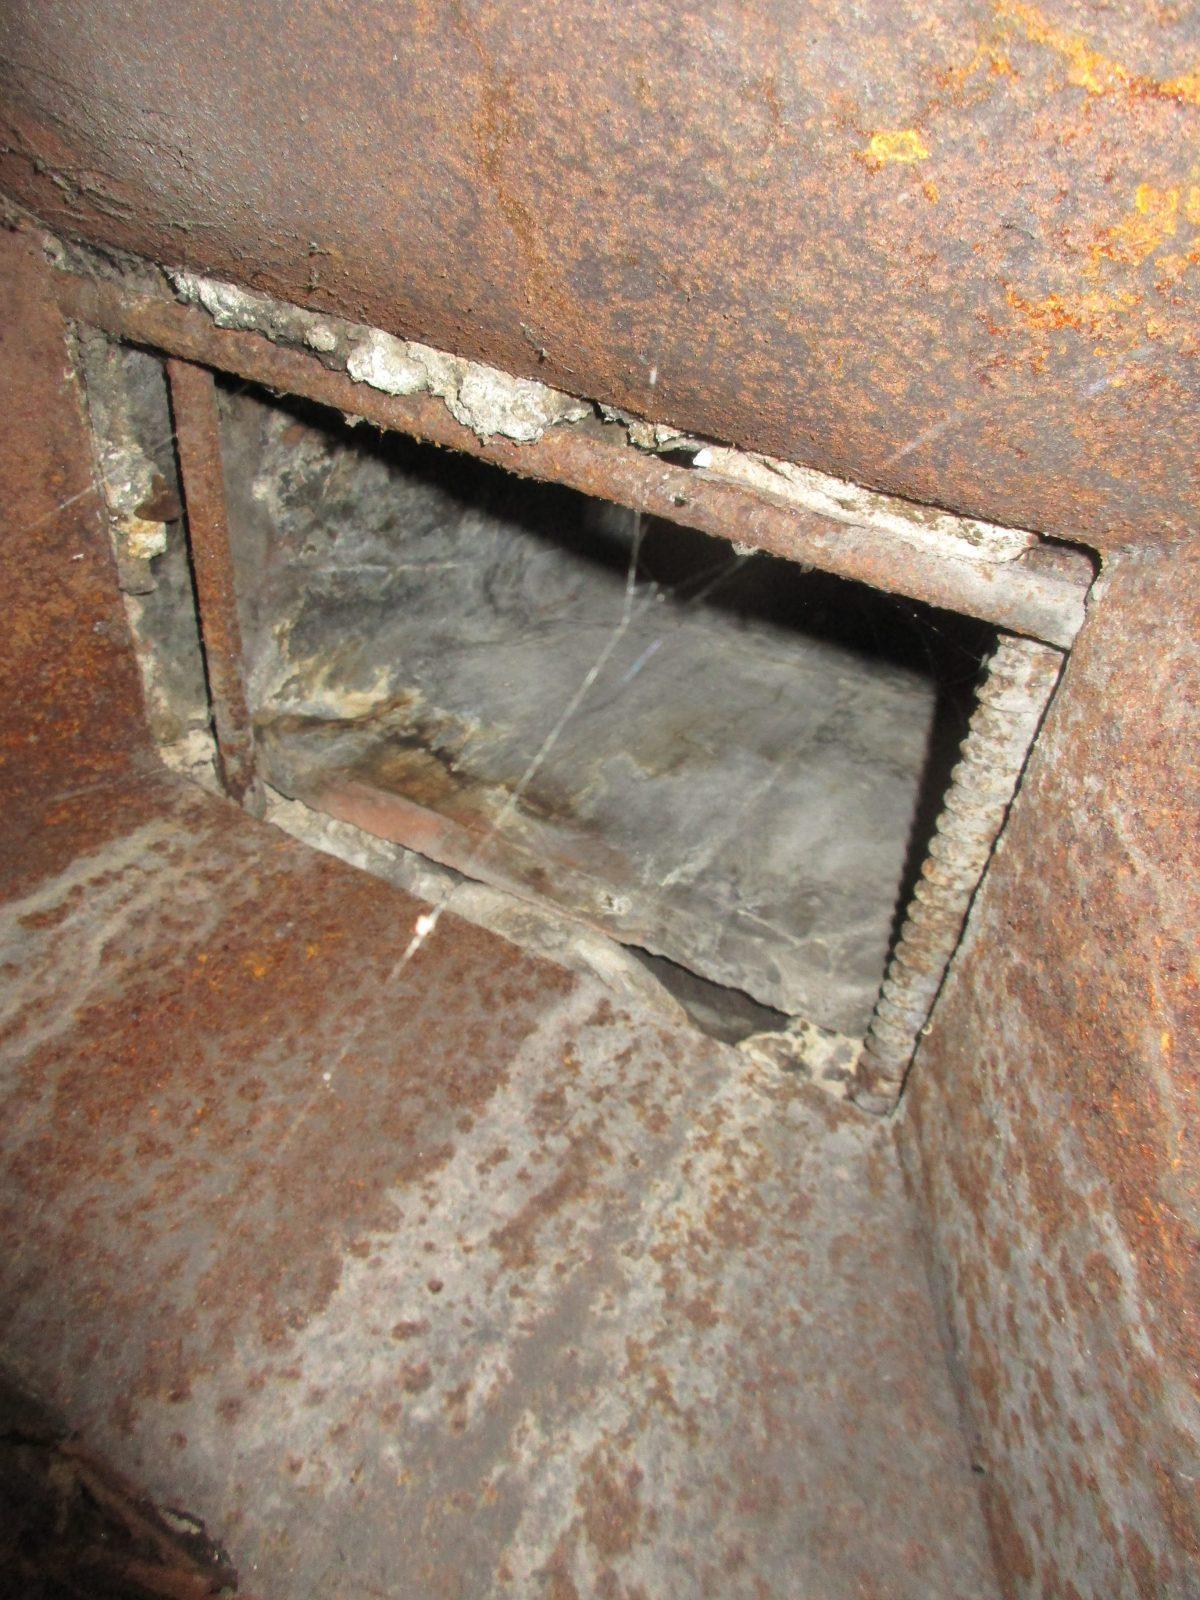 Gaps in flue pipe connection require repair.